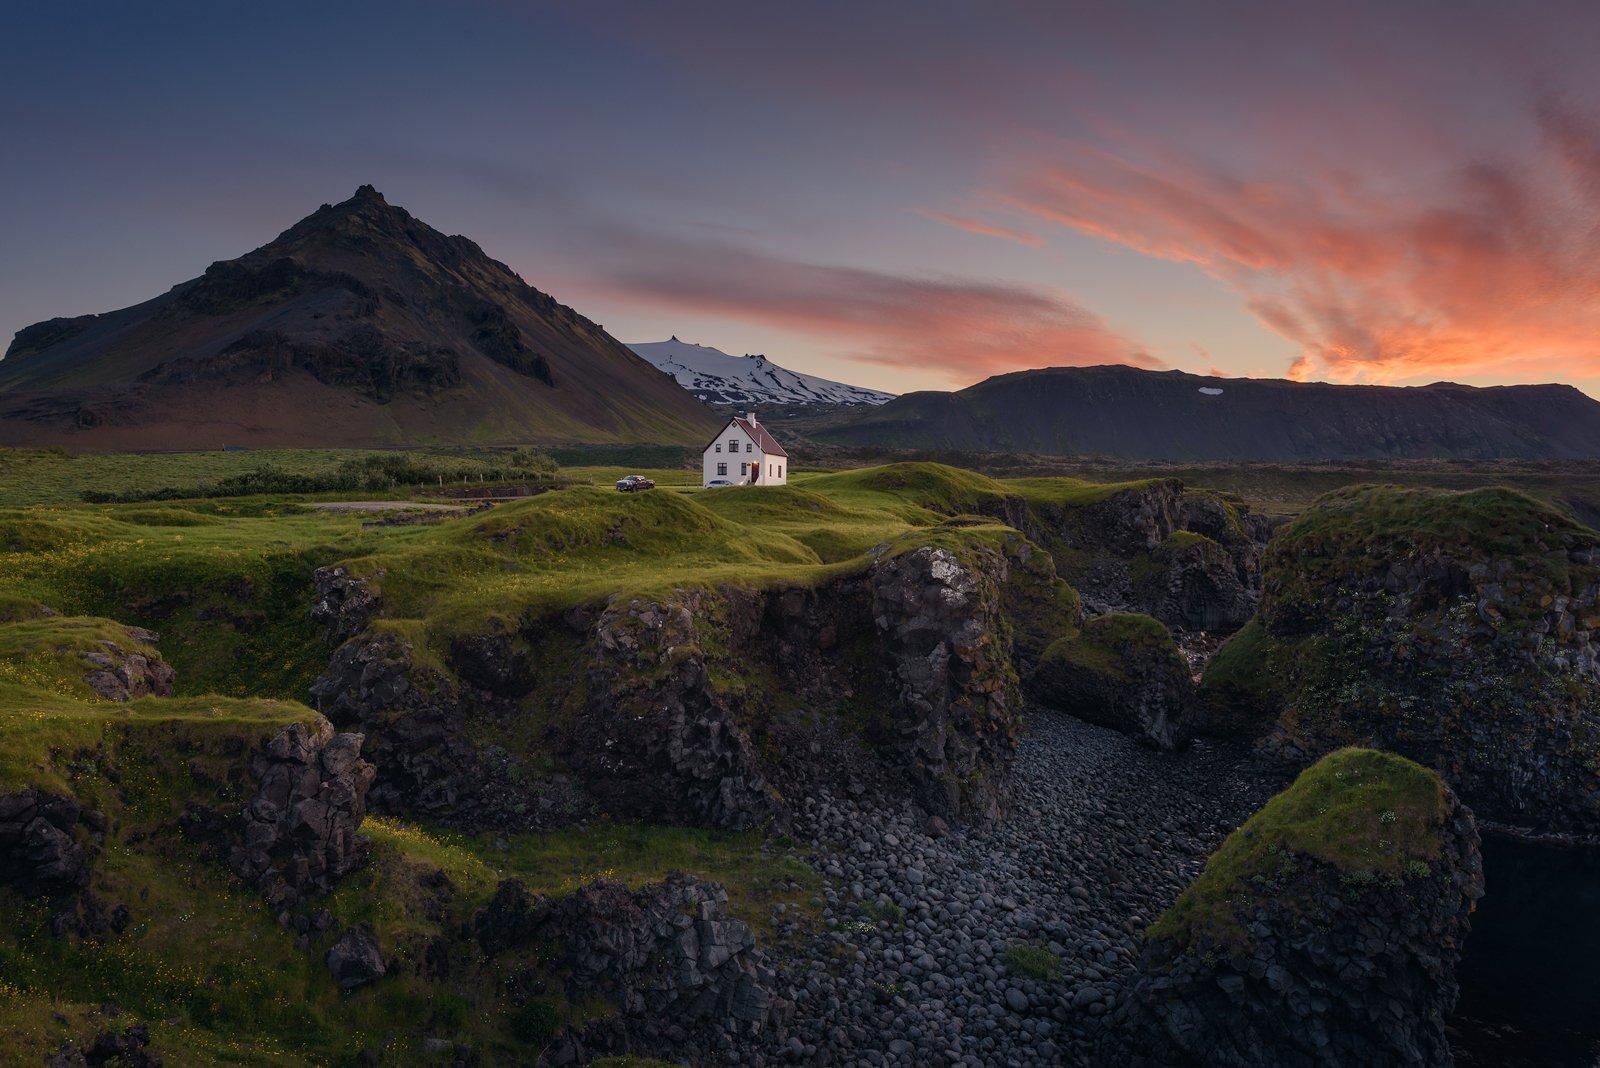 arnarstapi, iceland, landscape, nature, природа, пейзаж, исландия, закат, nikon, Дмитрий Виноградов